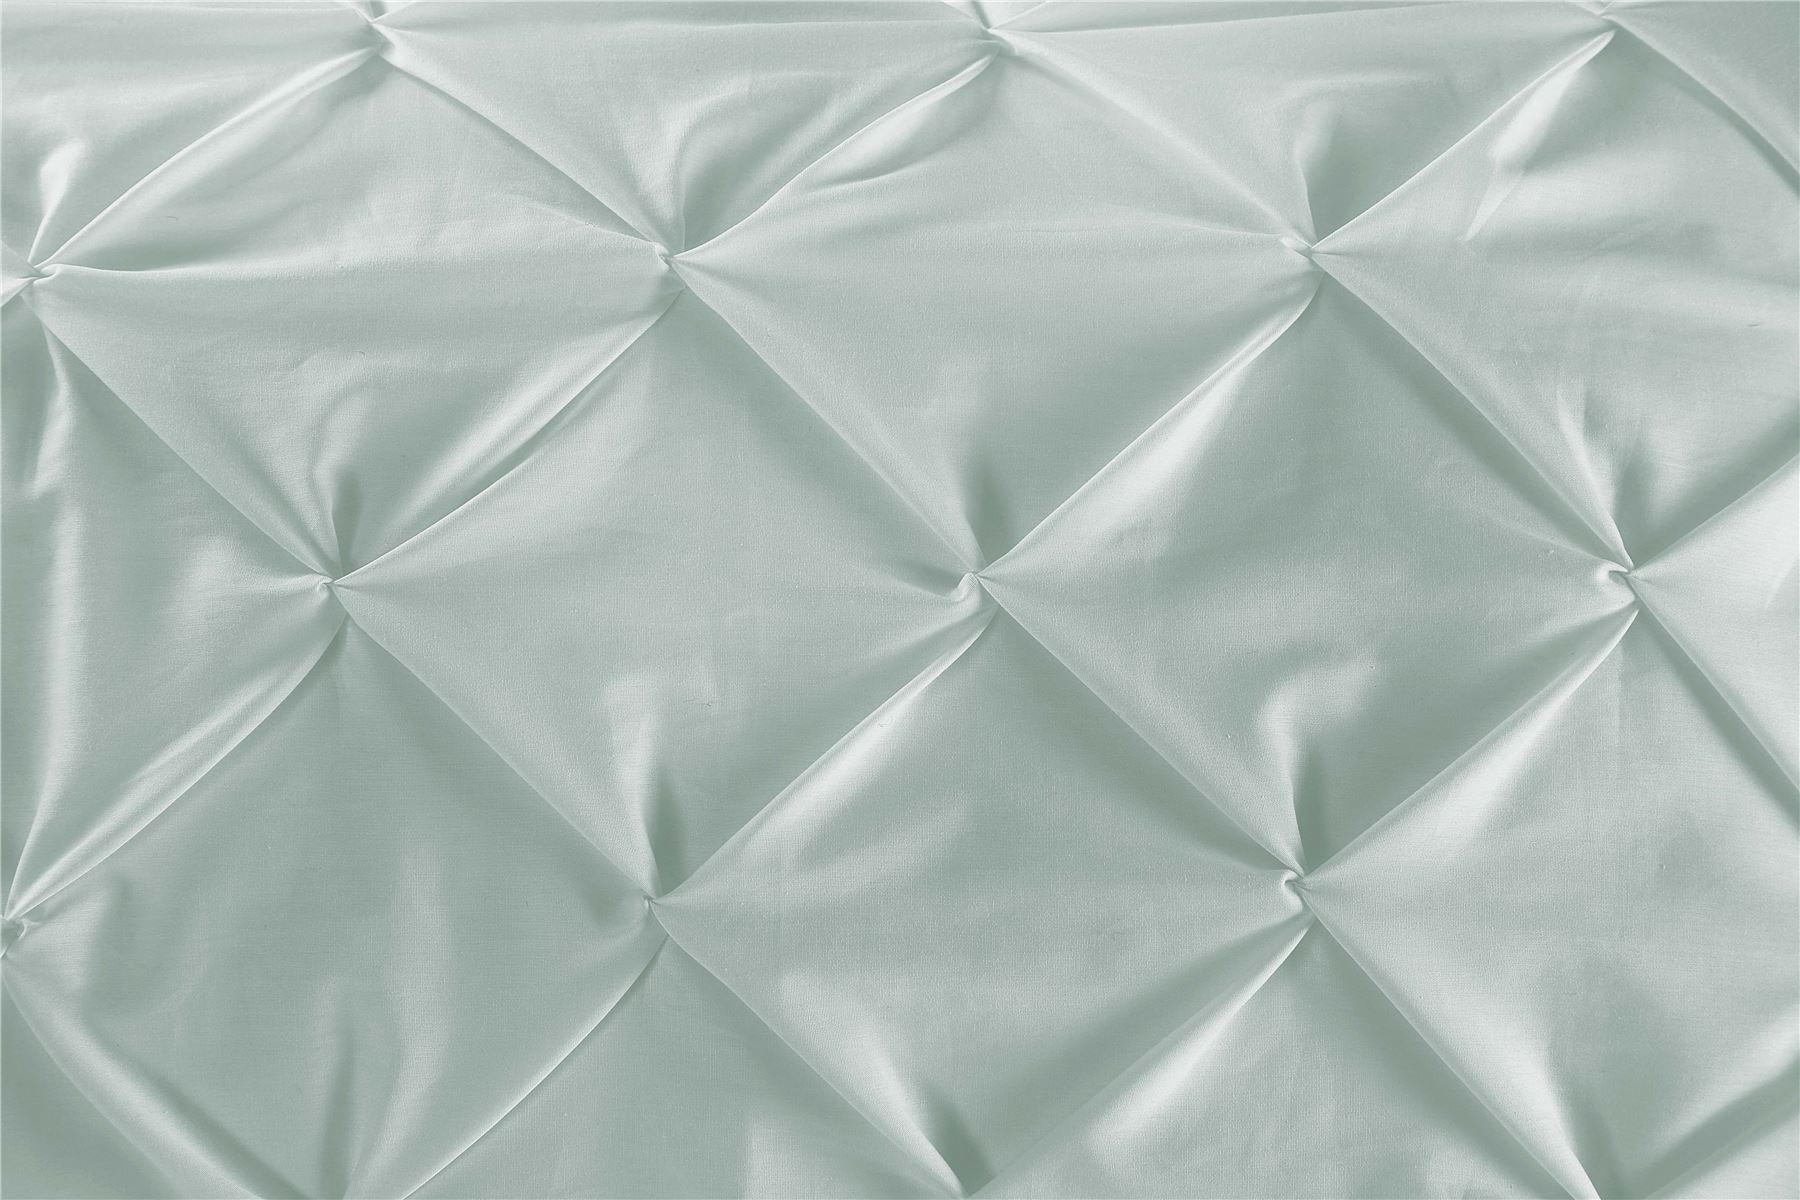 Luxury-Pure-100-Cotton-200-Thread-Pinch-Pleat-Pintuck-Puckering-Duvet-Cover-Set thumbnail 16